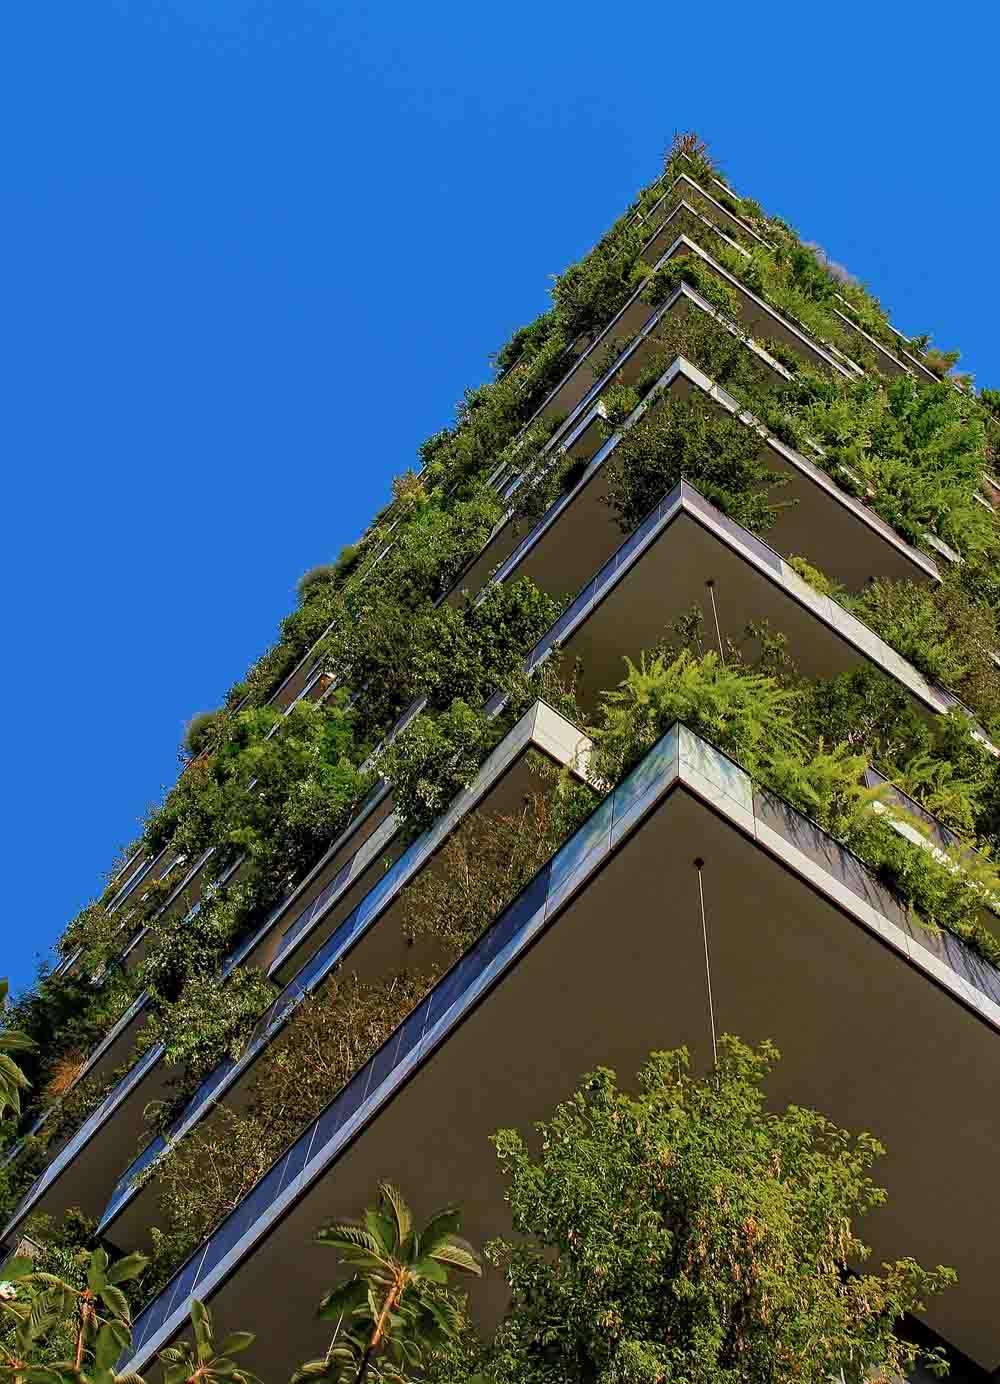 Eficiencia como modelo energético en edificios públicos